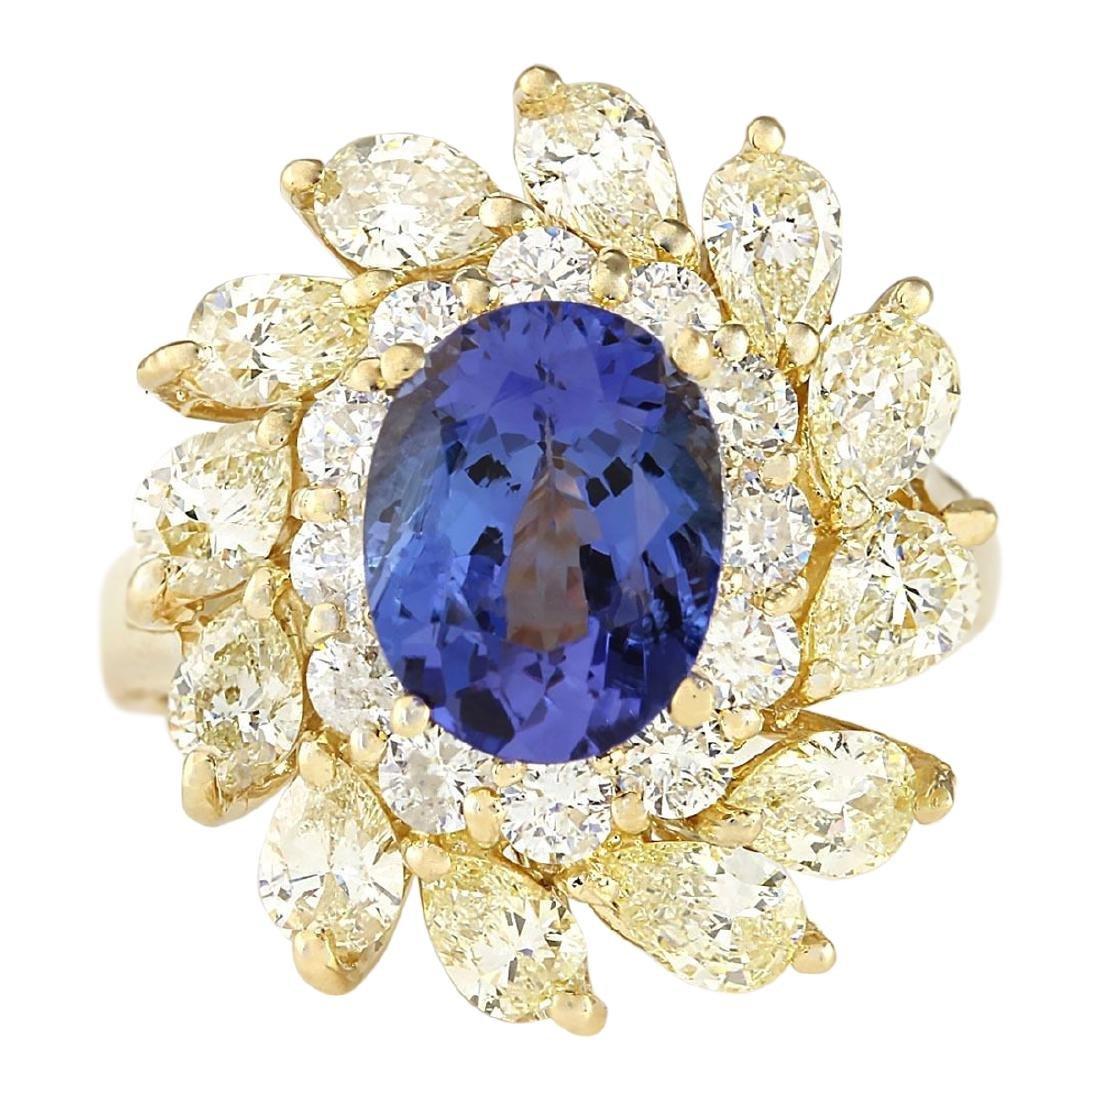 5.73 CTW Natural Tanzanite And Diamond Ring In 18K